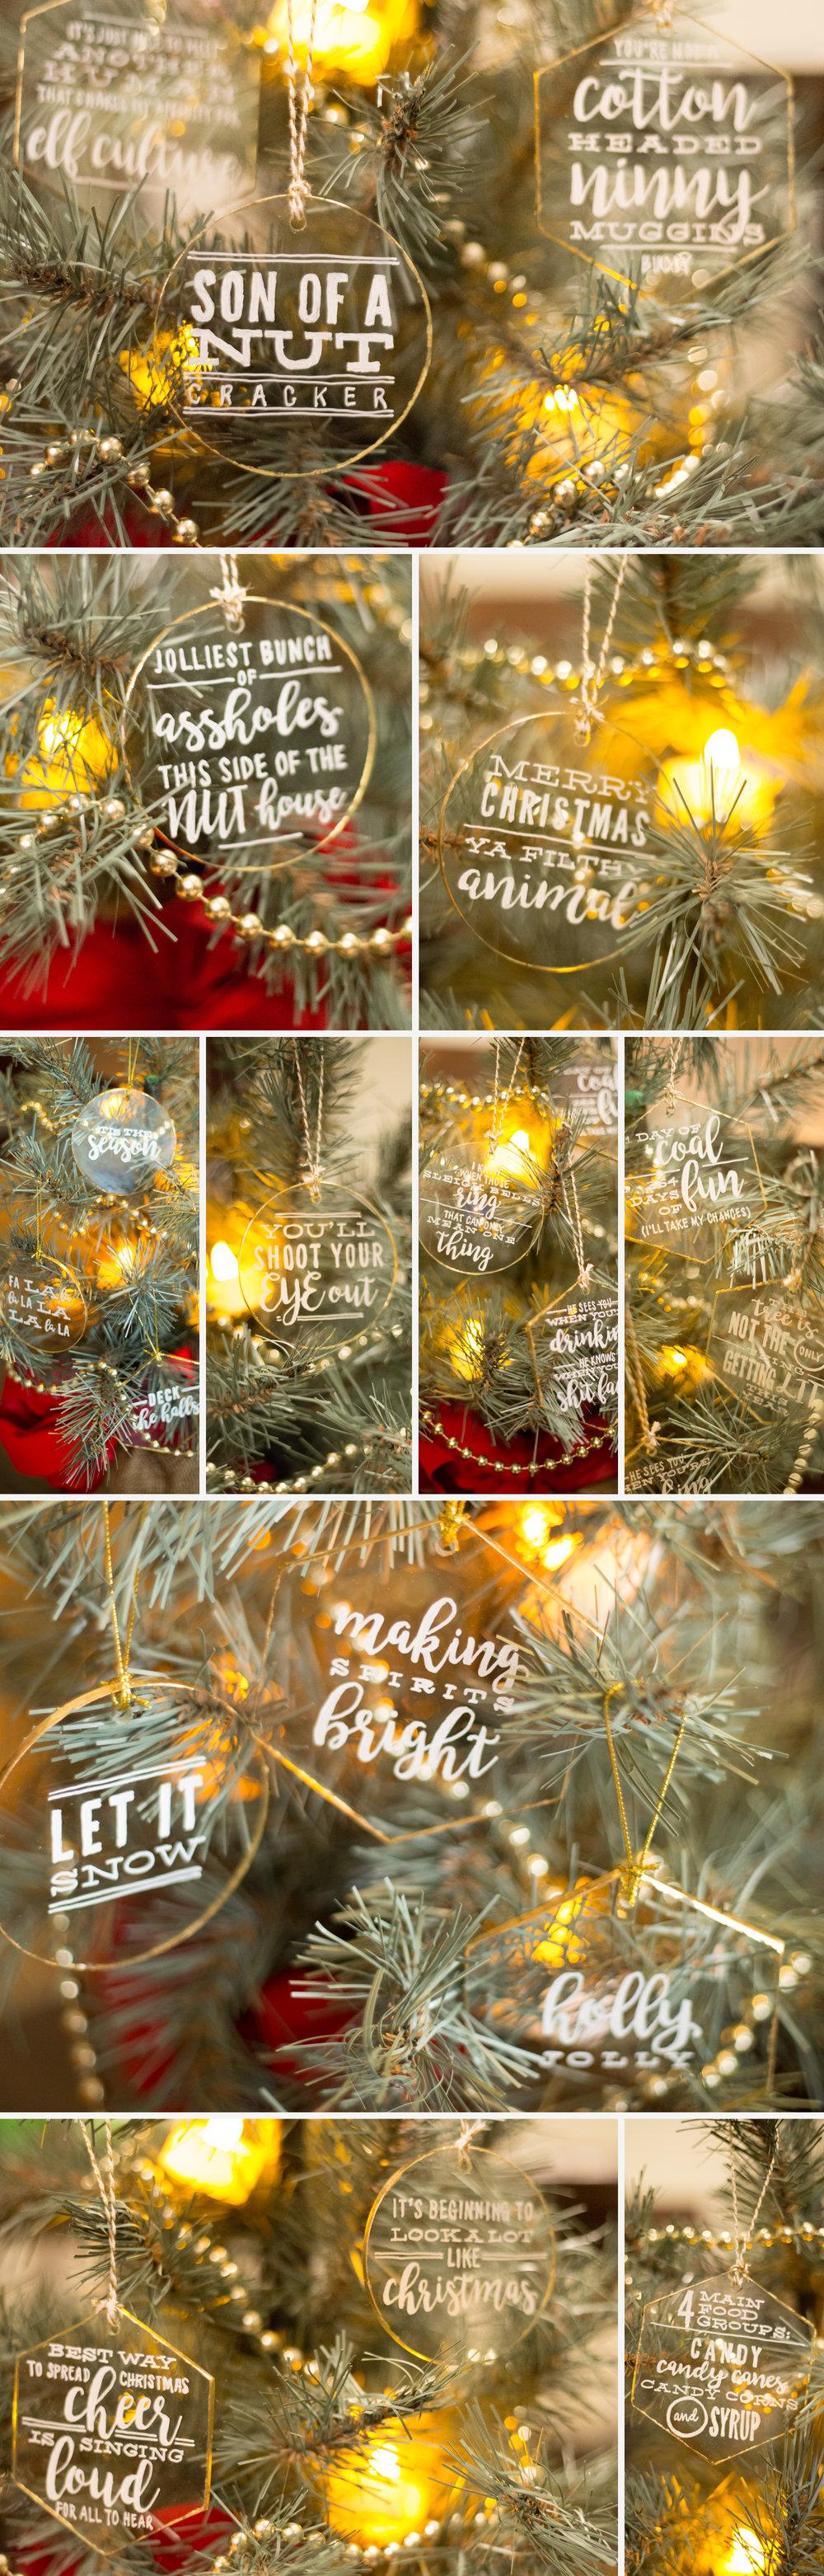 Christmas Ornaments.jpg